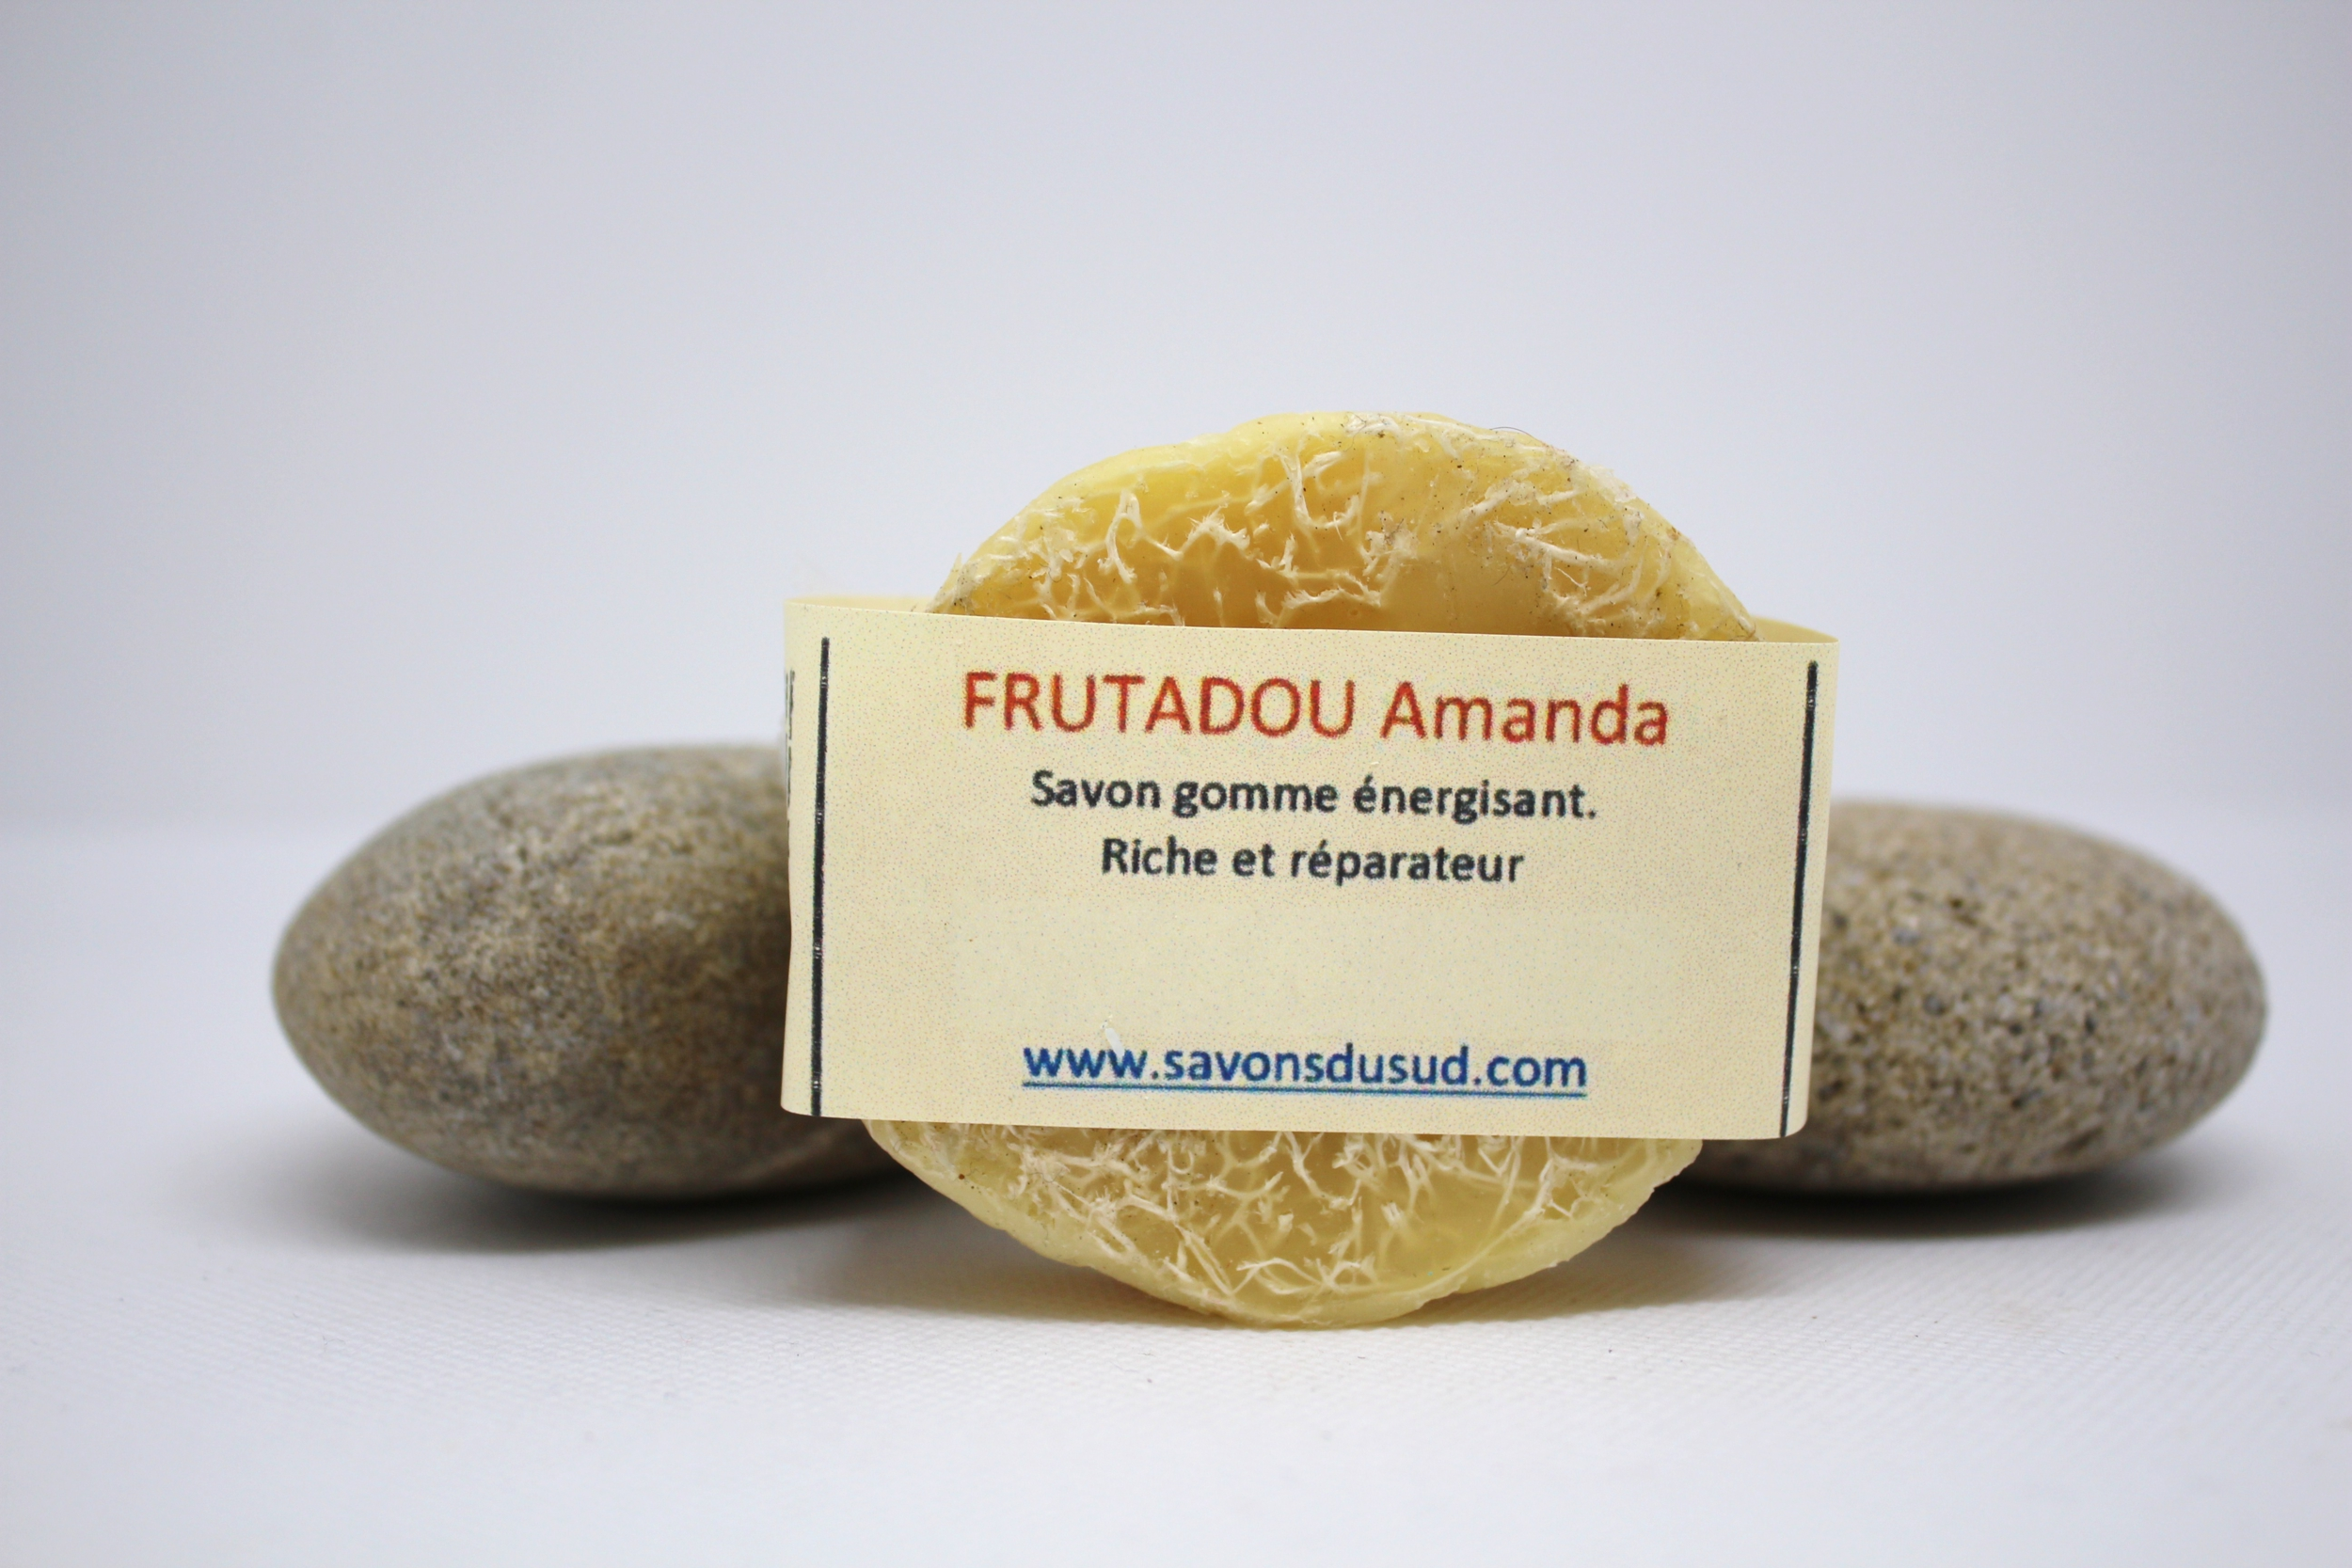 Frutadou Amanda